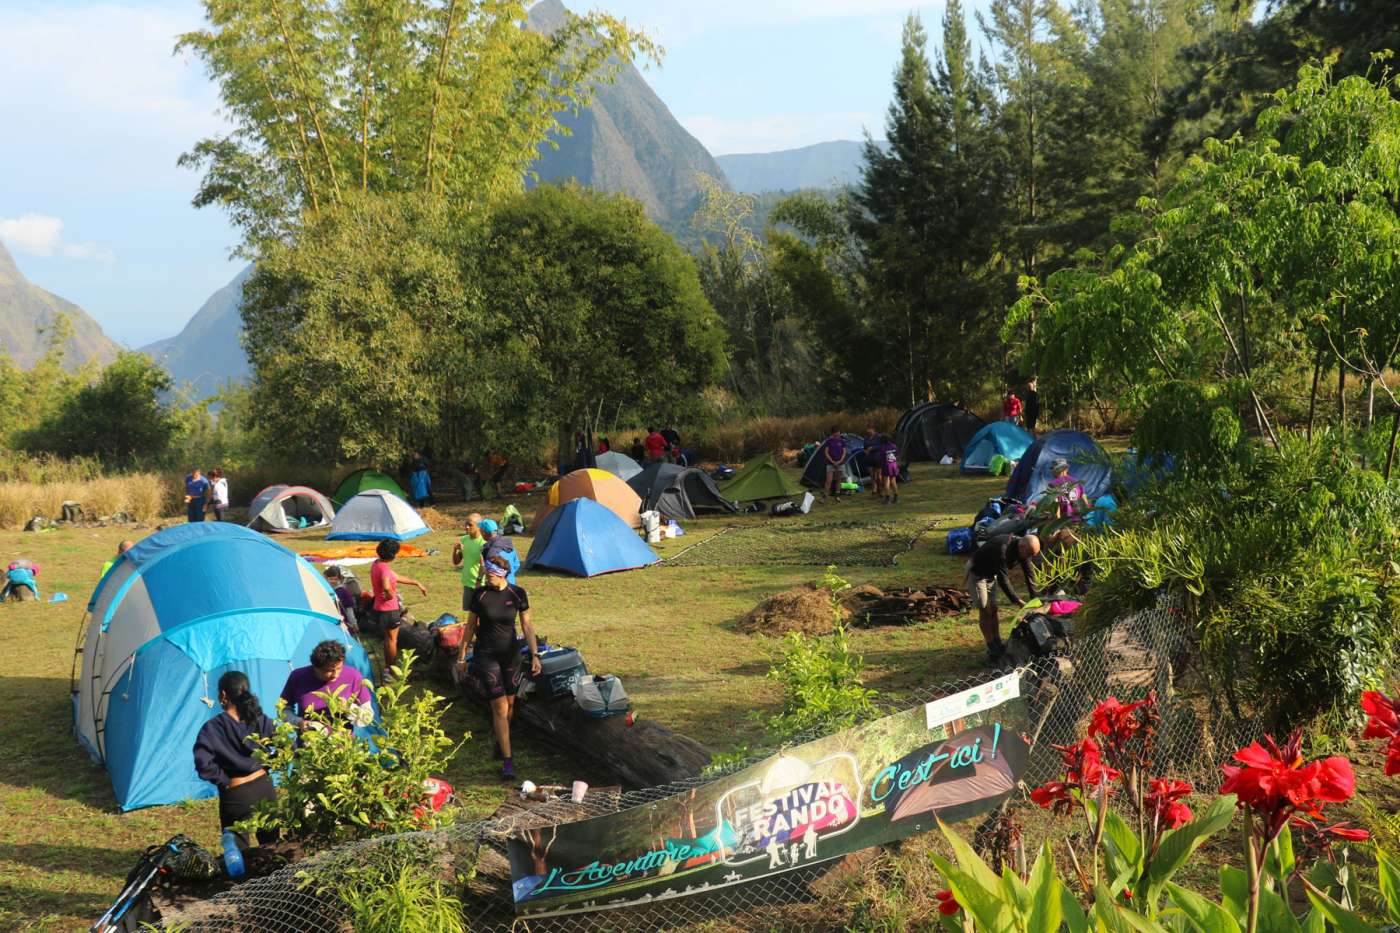 Le festival de la rando : la grande vadrouille 974